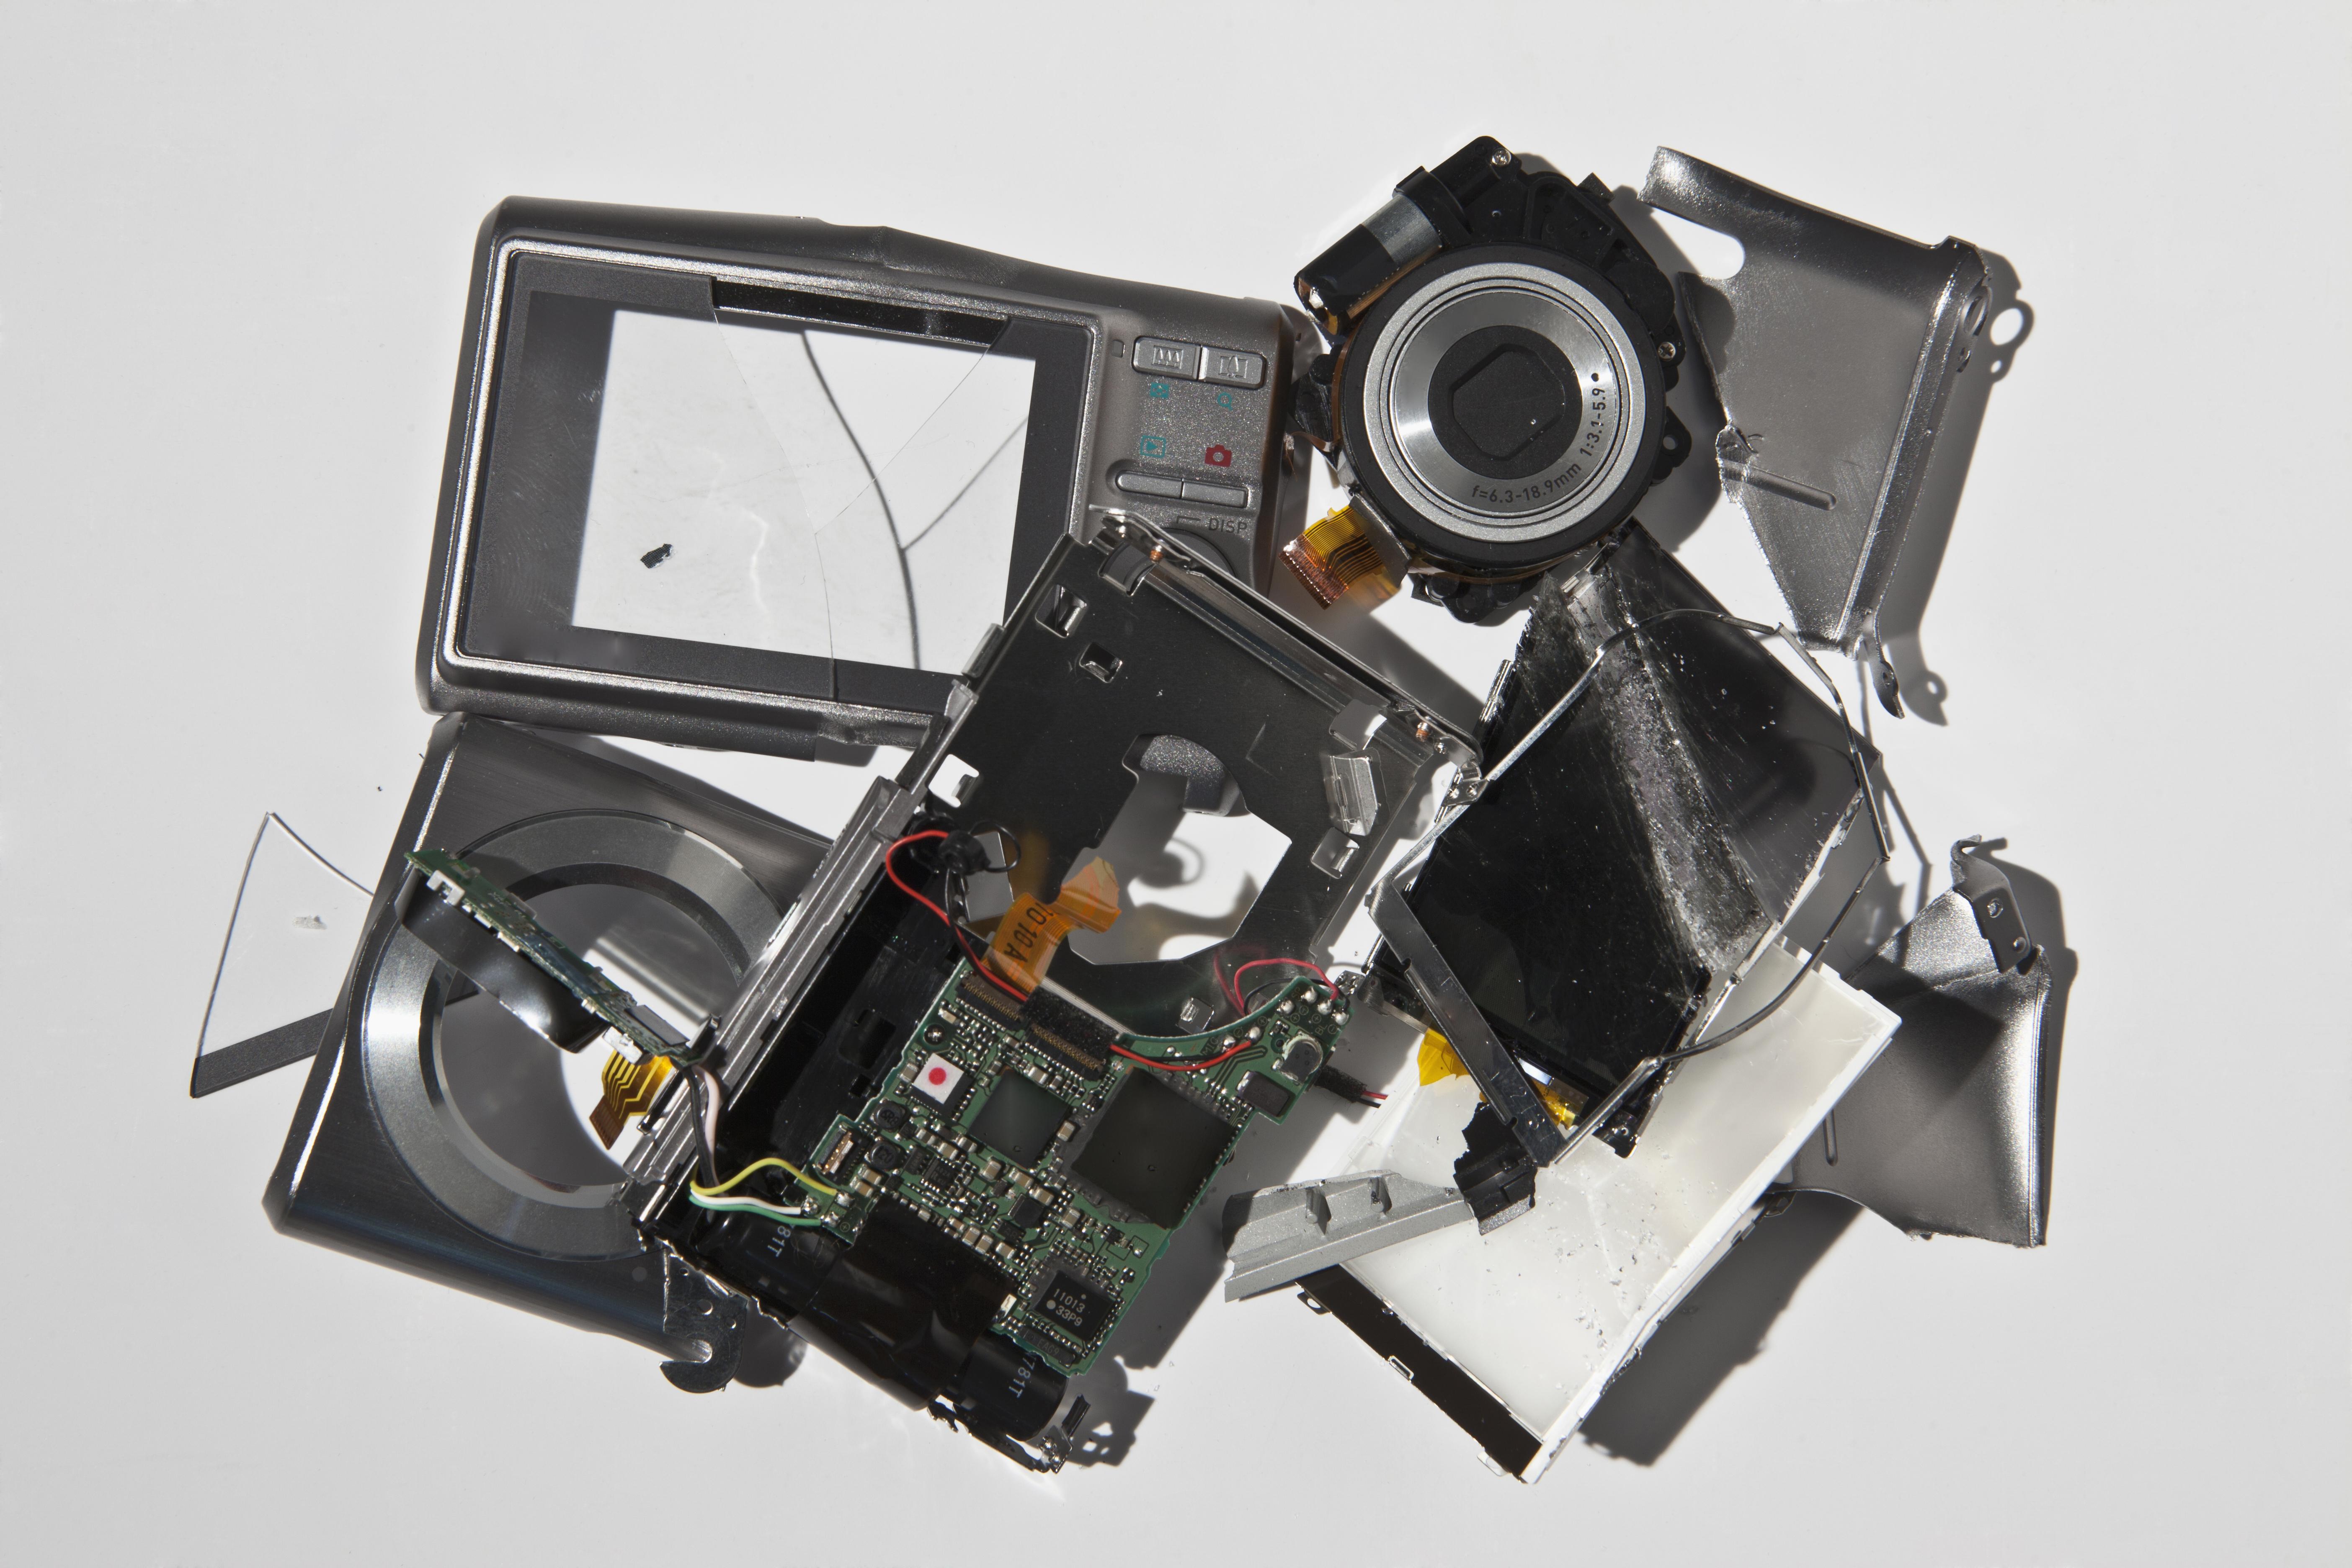 Pile of smashed camera parts